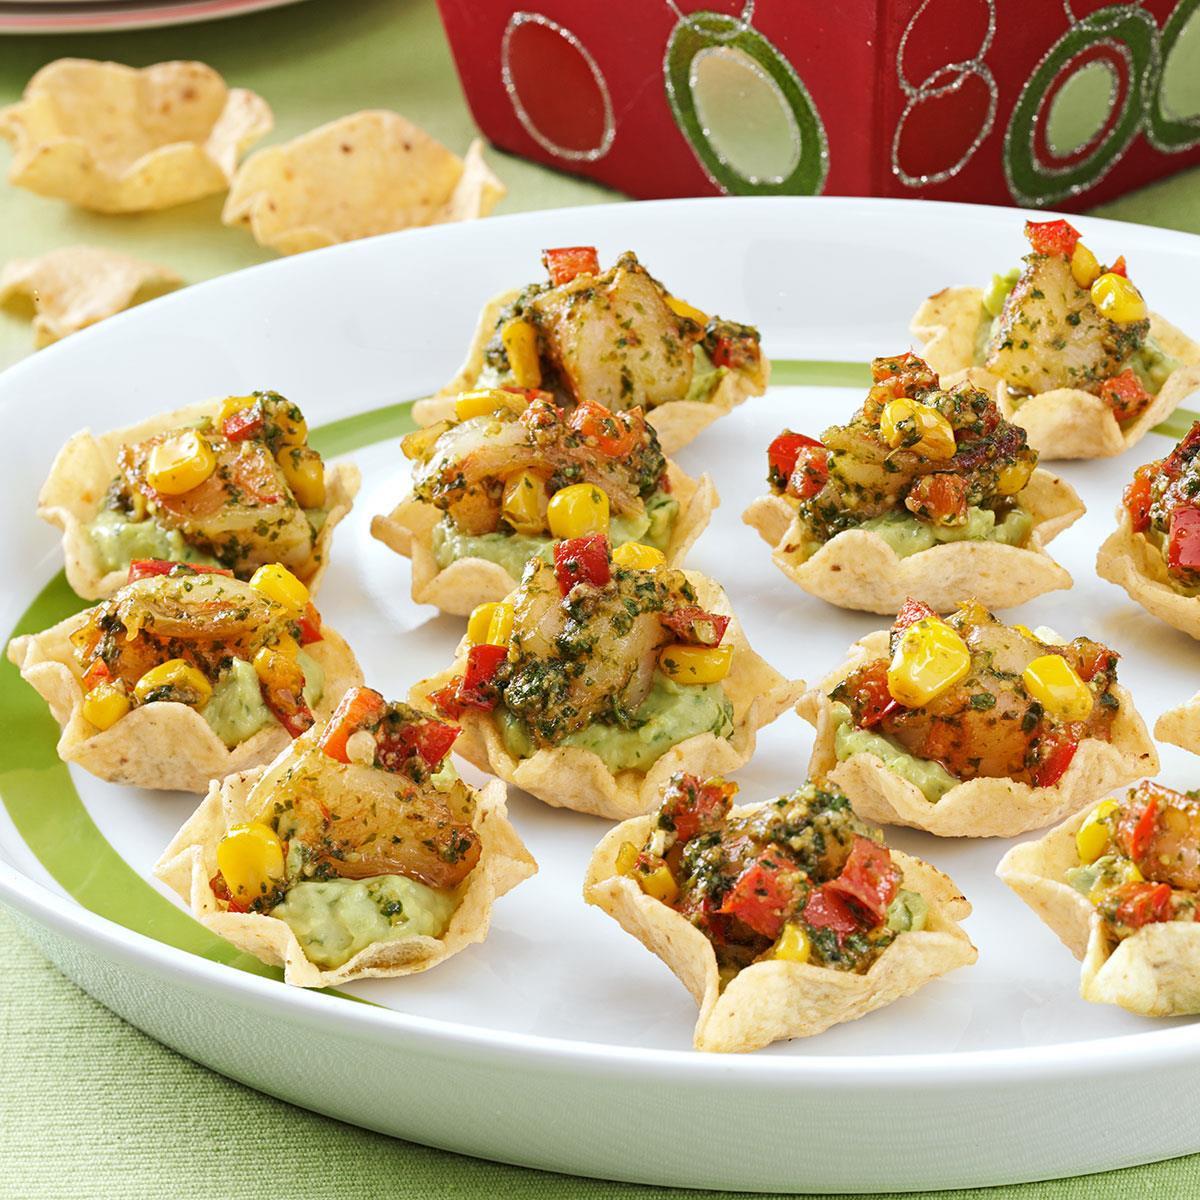 Shrimp Appetizer Recipes  Guacamole Shrimp Appetizers Recipe